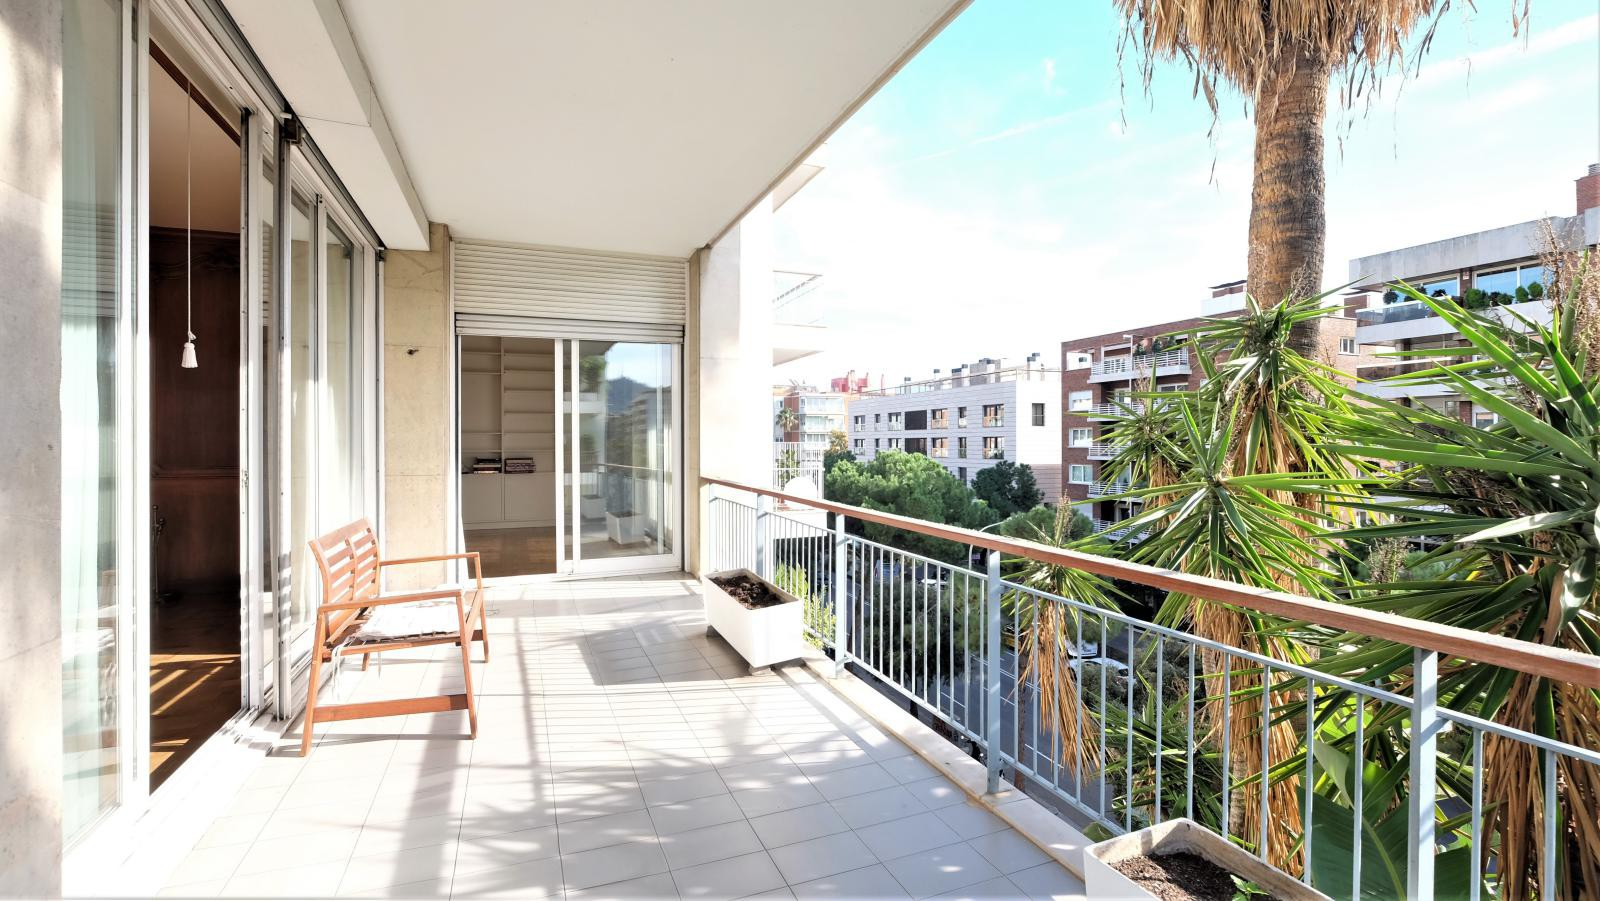 MG Inmobiliaria Barcelona - via-augusta-tres-torres-ganduxer